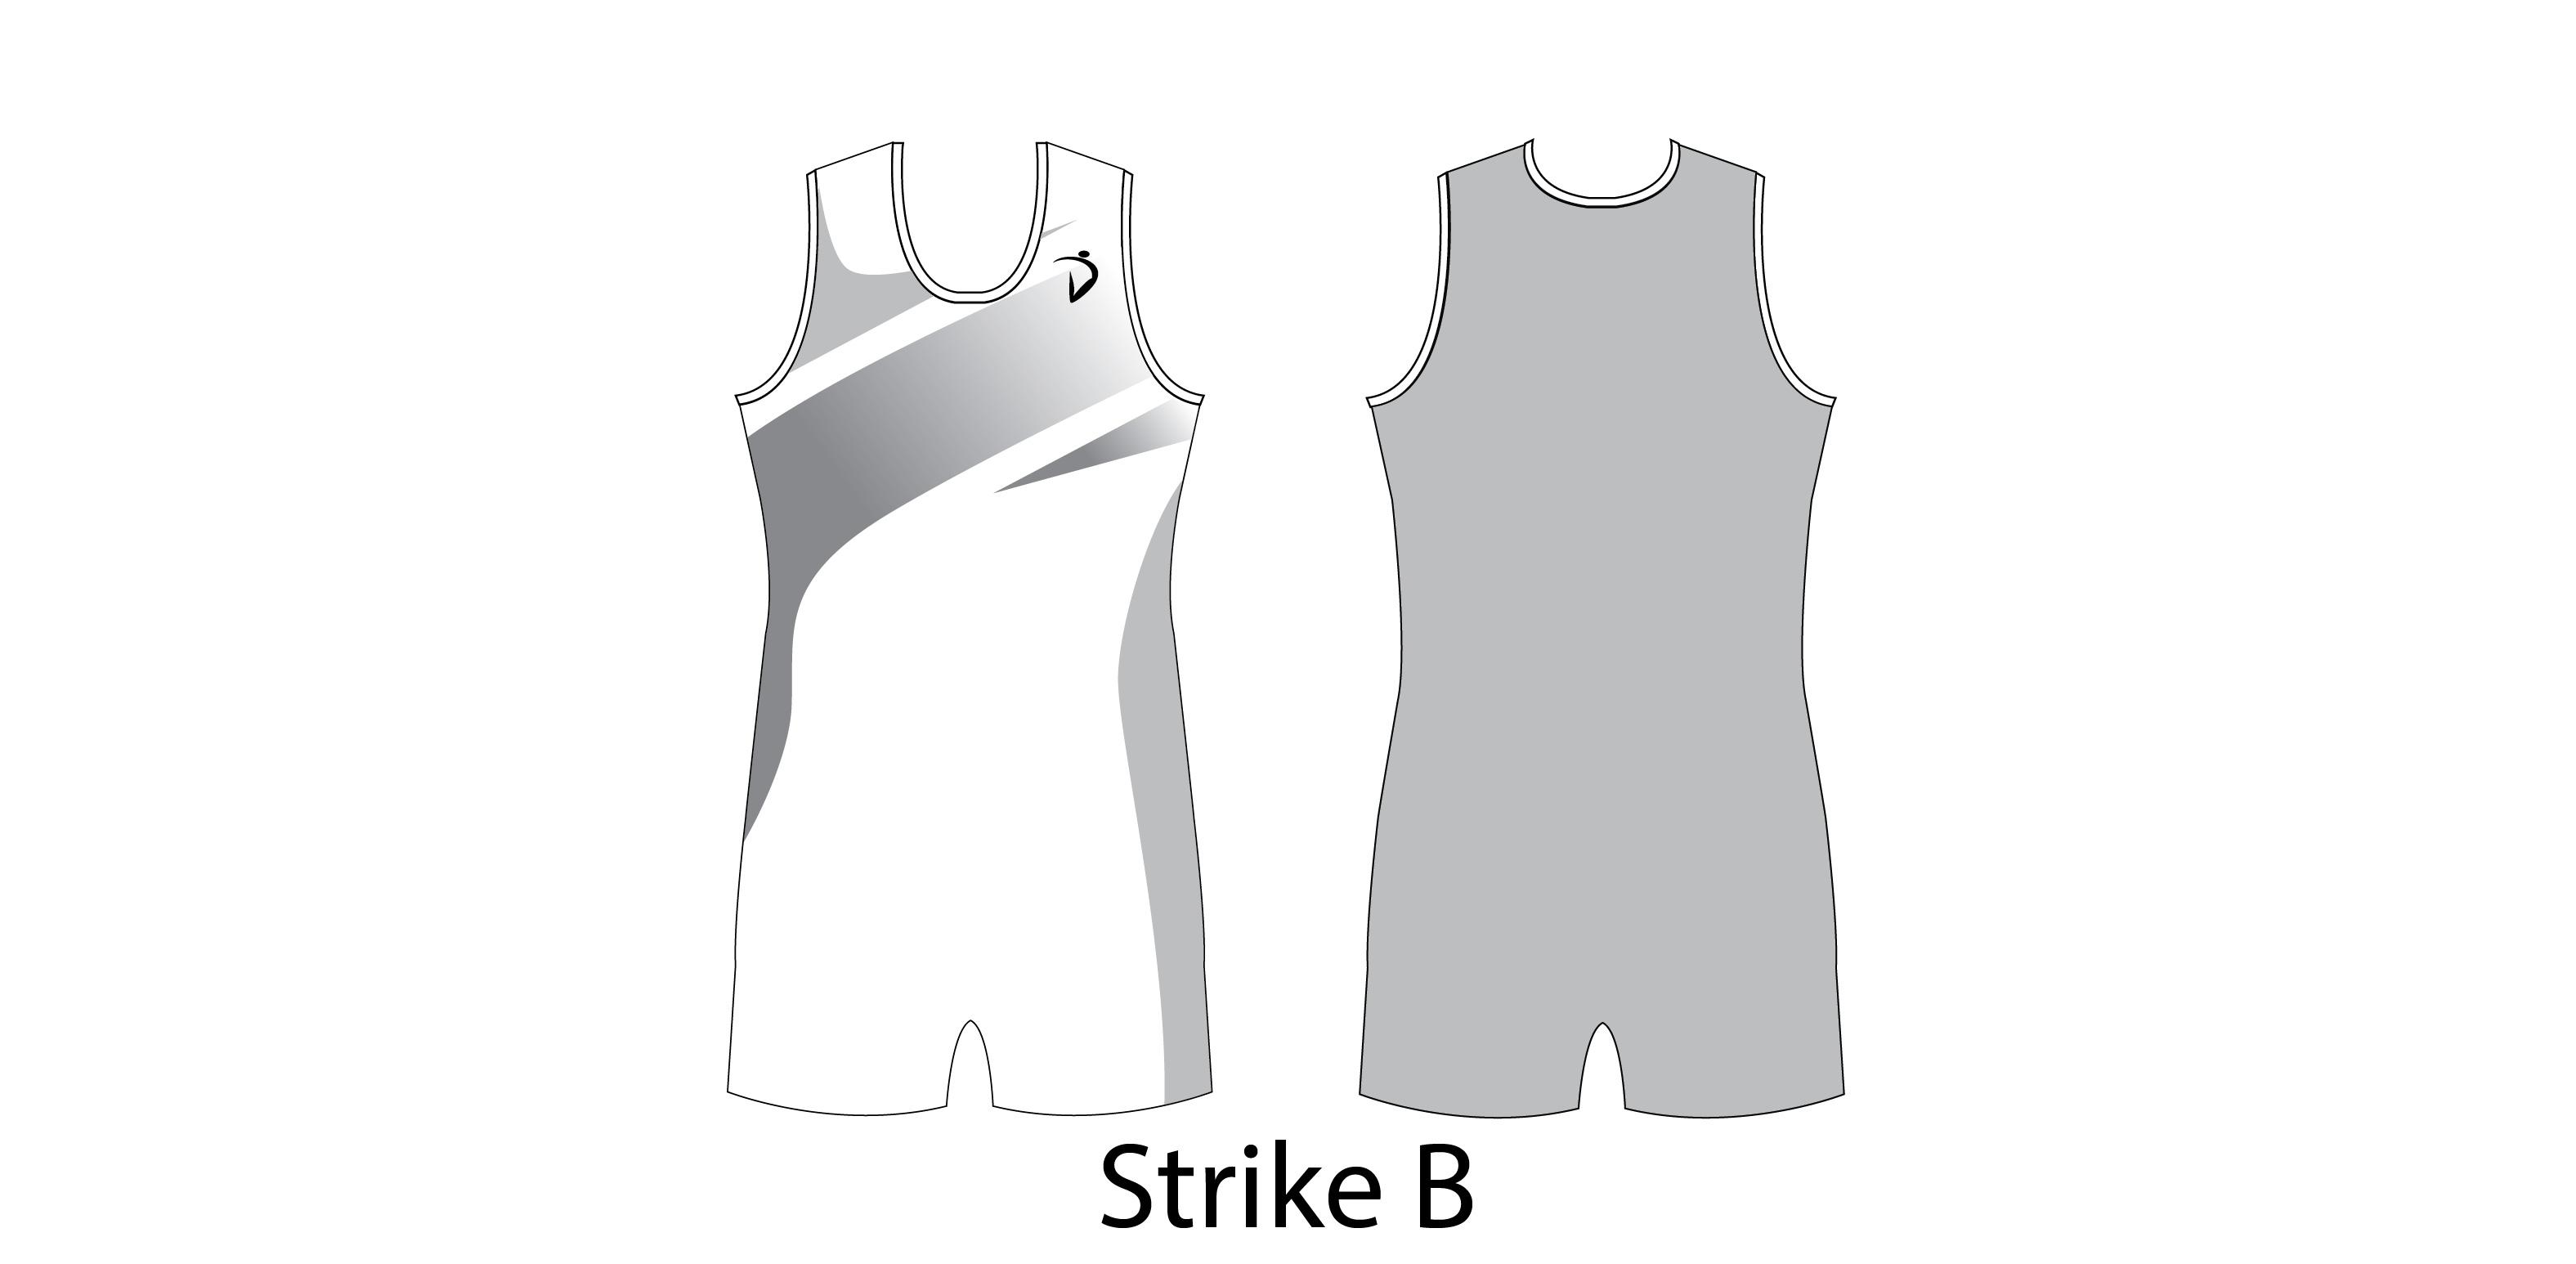 Strike B